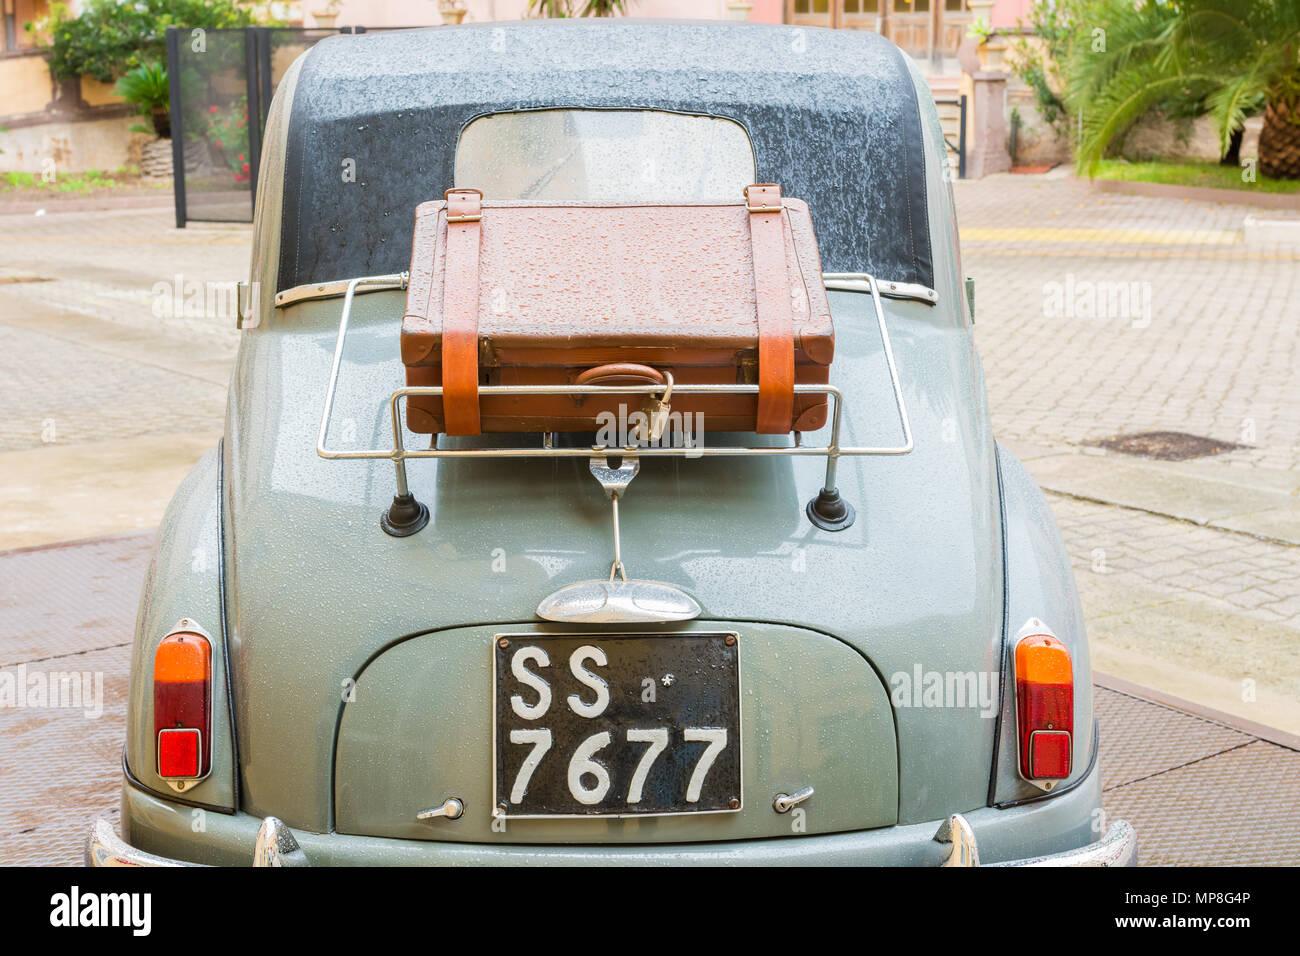 FIAT 500 C 'Topolino' (1950) -  a classic vintage italian car, Cagliari, Sardinia, Italy. - Stock Image